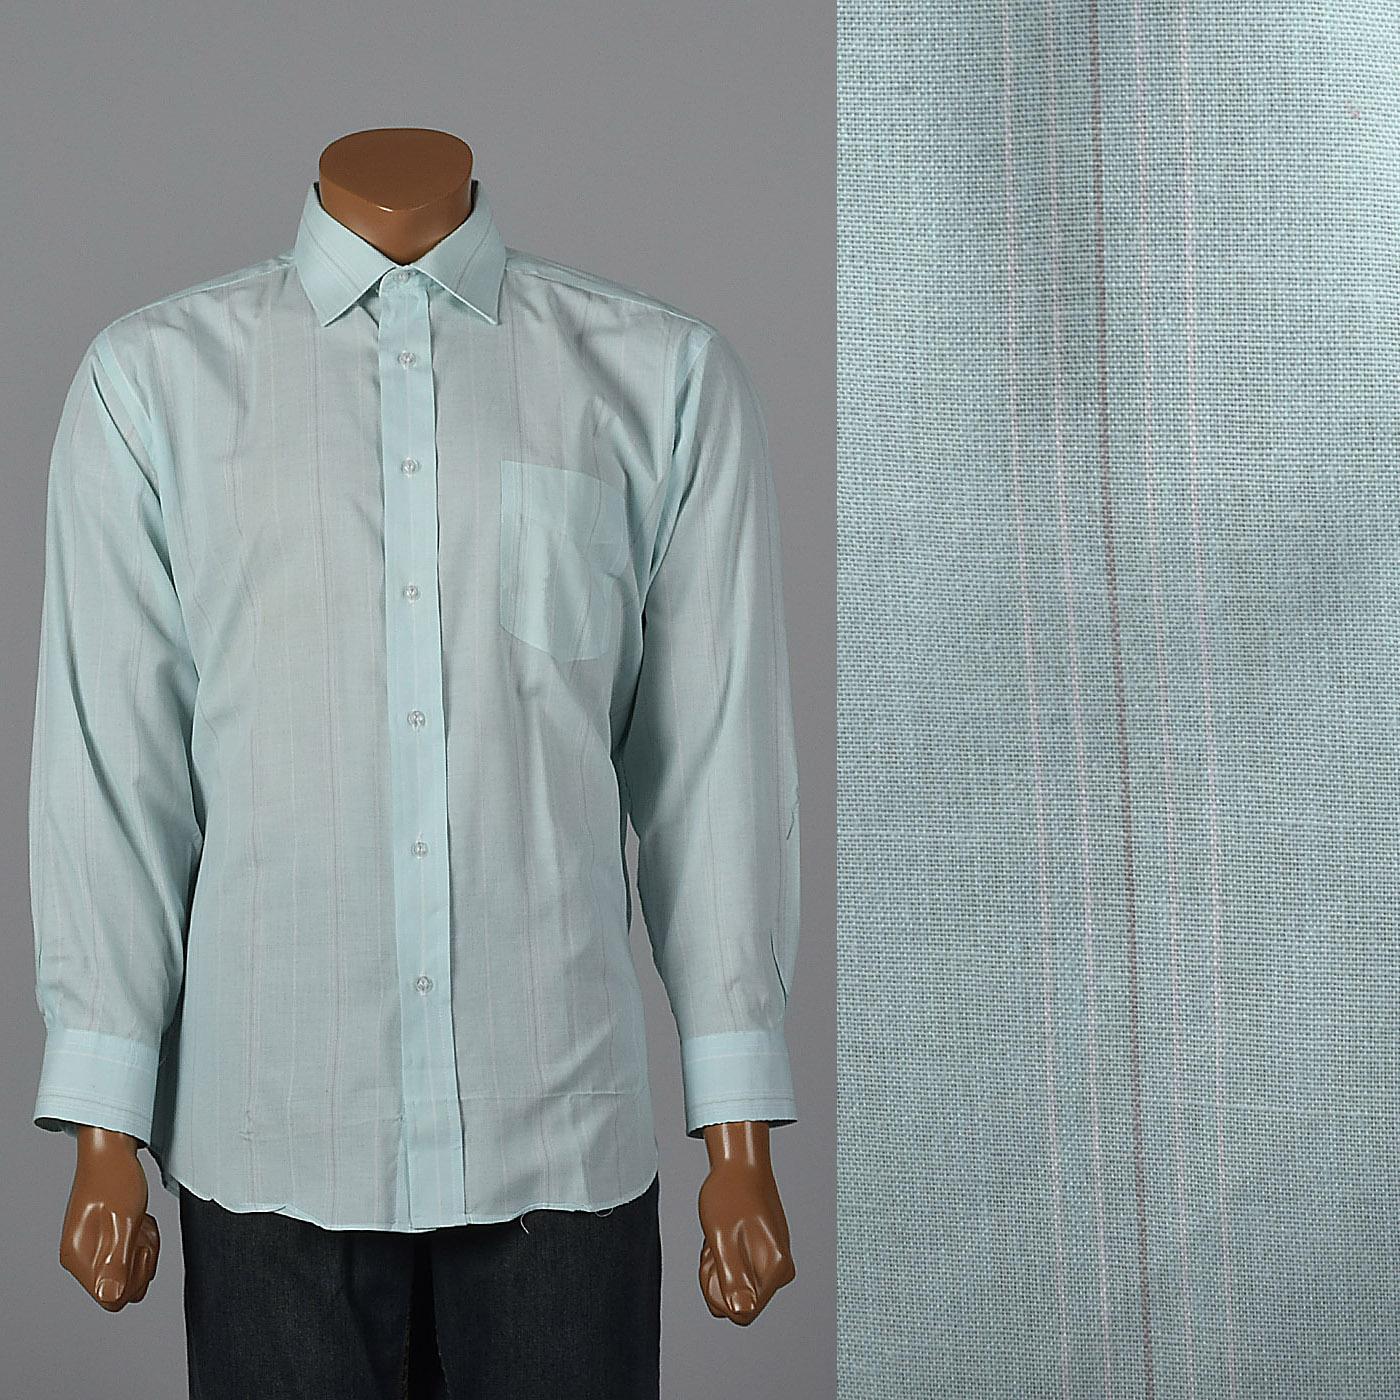 b56a17133 Details about XL Vintage 1990s 90s Aqua Striped Dress Shirt Easter Summer  Chest Stripes Pocket